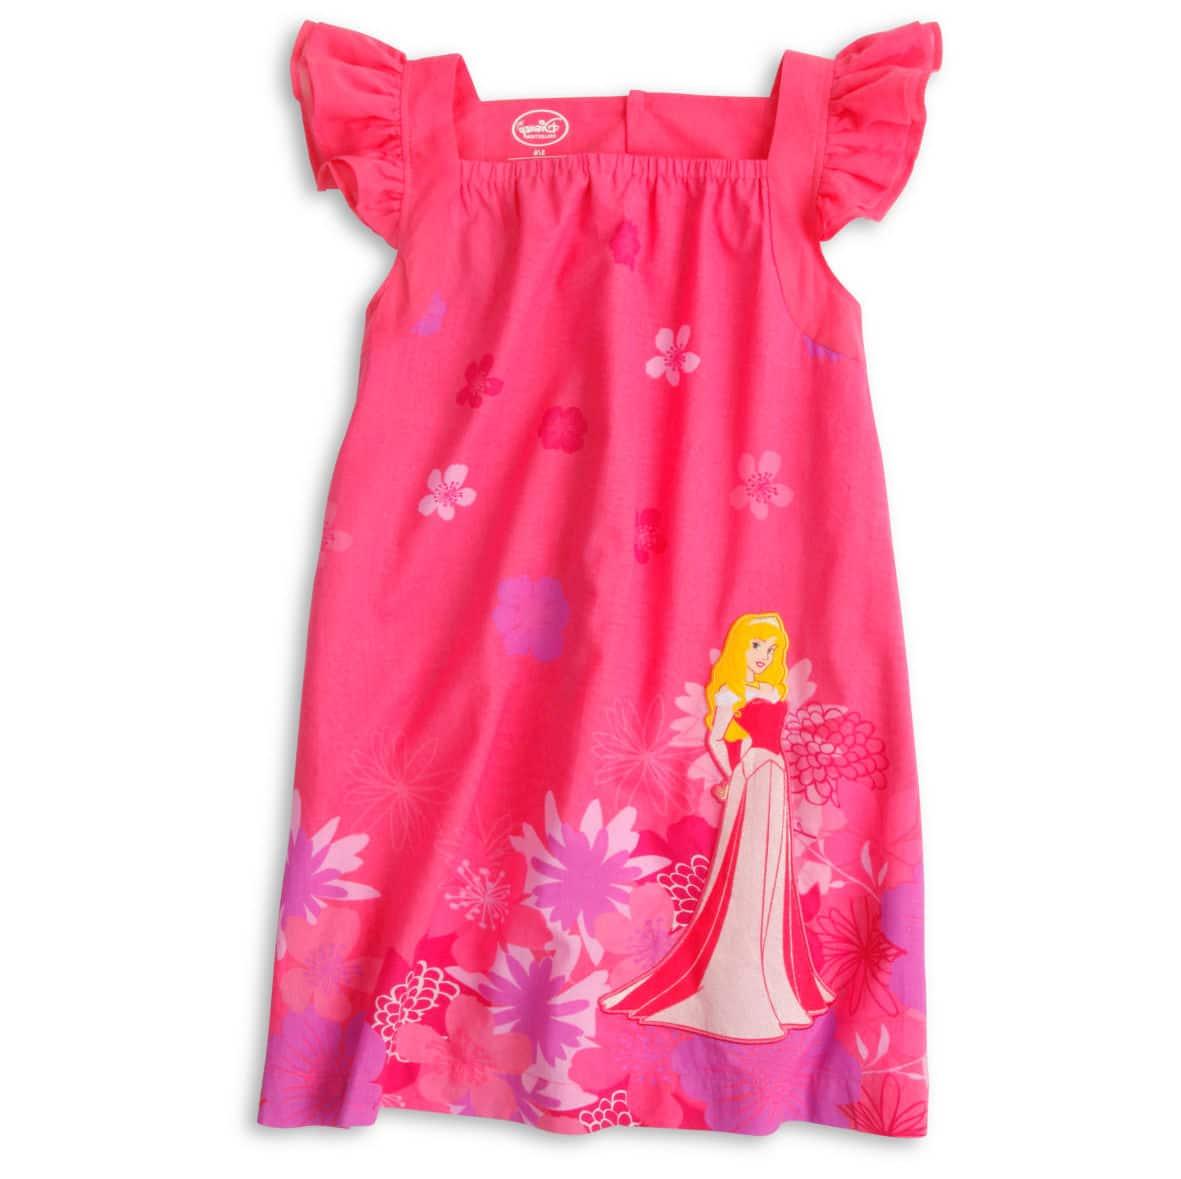 Online Minnie Mouse Clothes Picture